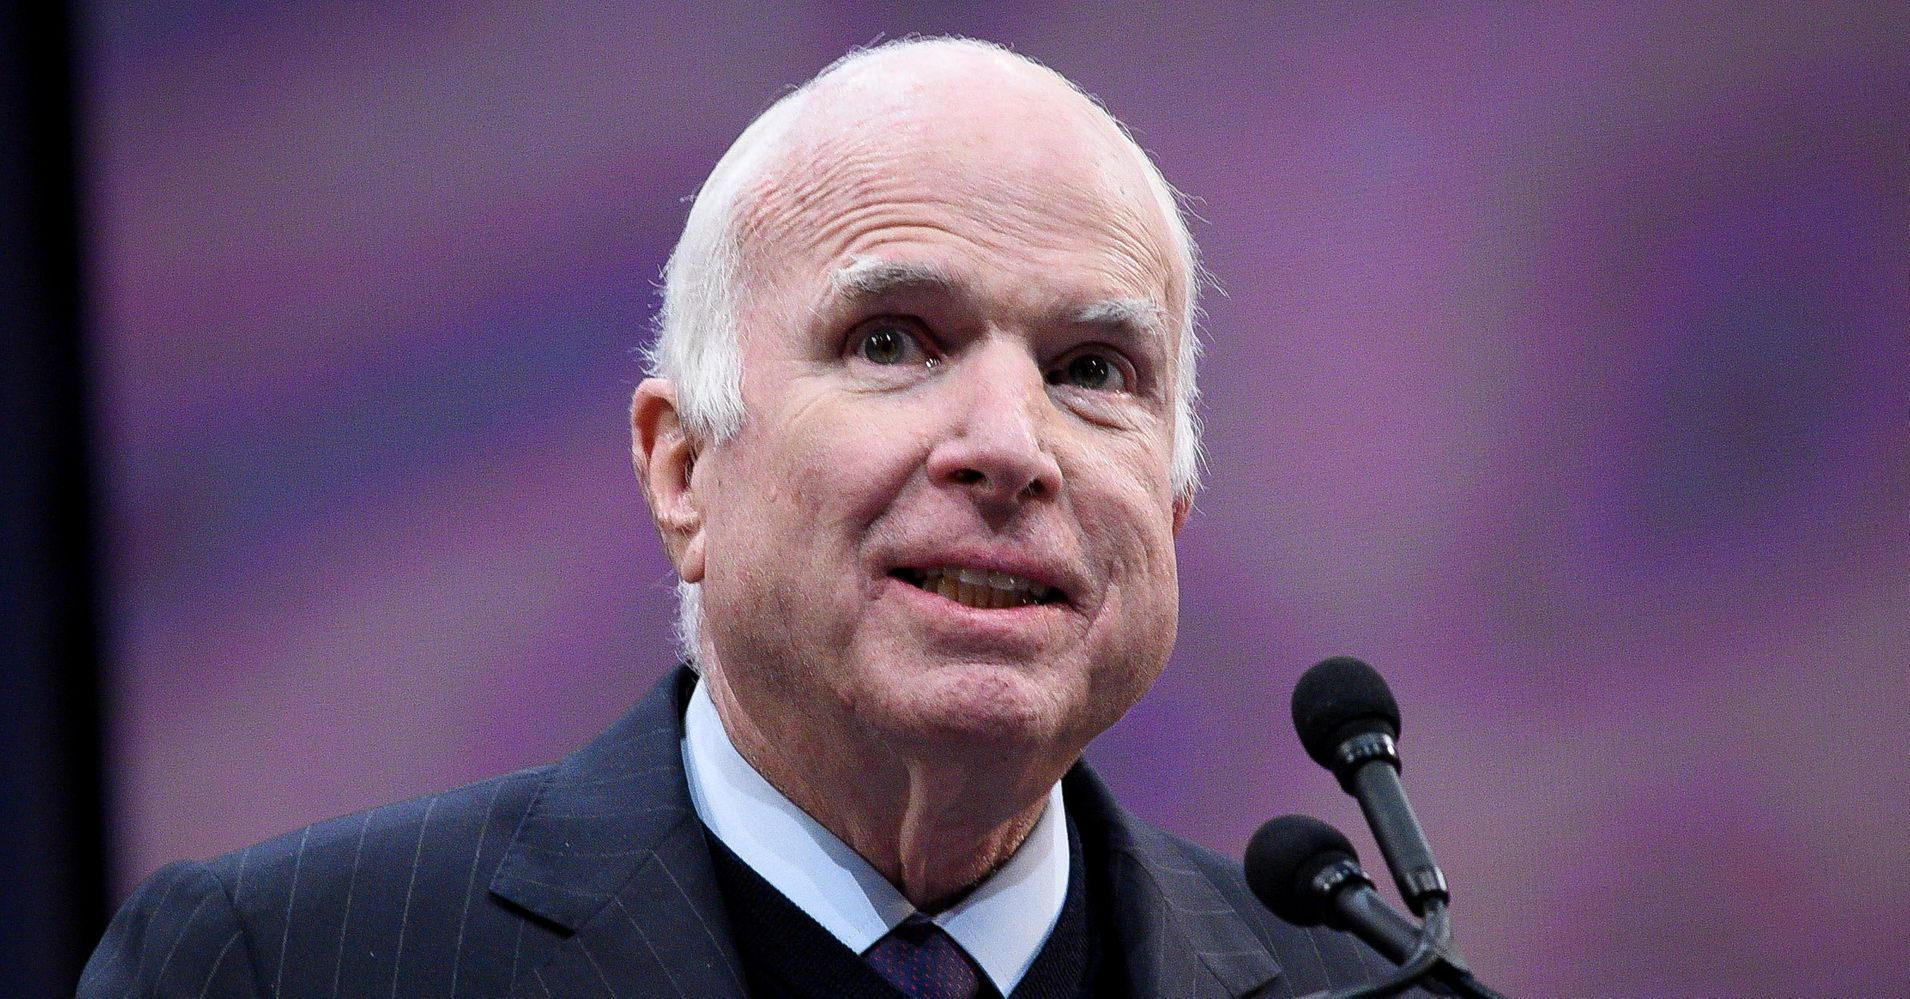 John McCain, Accepting Award For Public Service, Slams 'Half-Baked' Nationalism